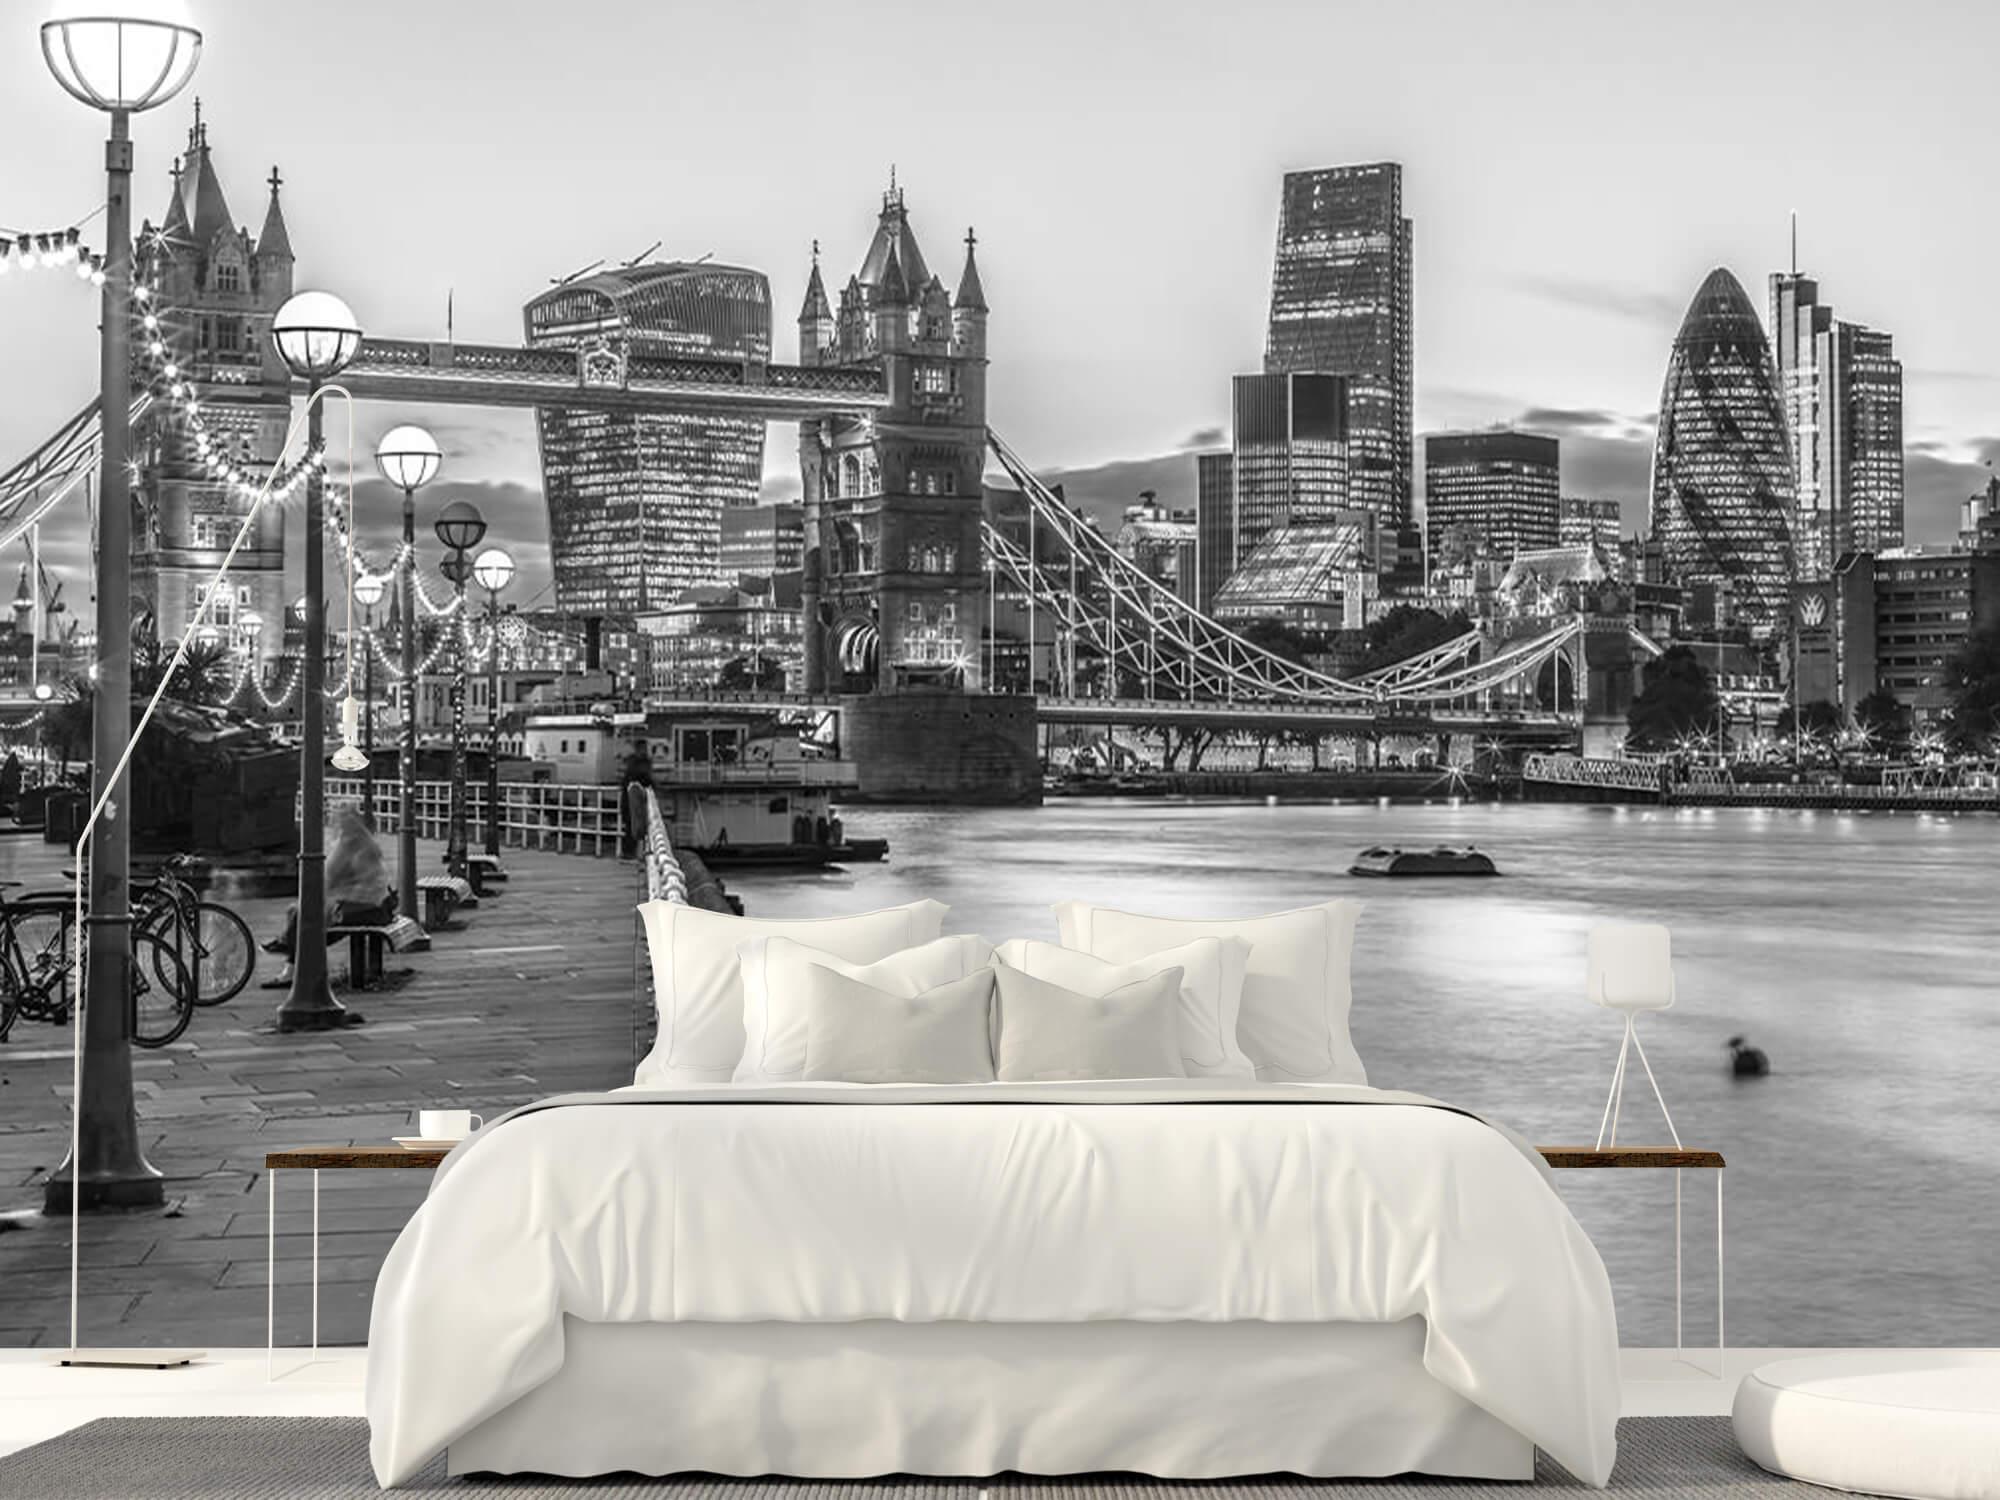 London Riverside Promenade 5